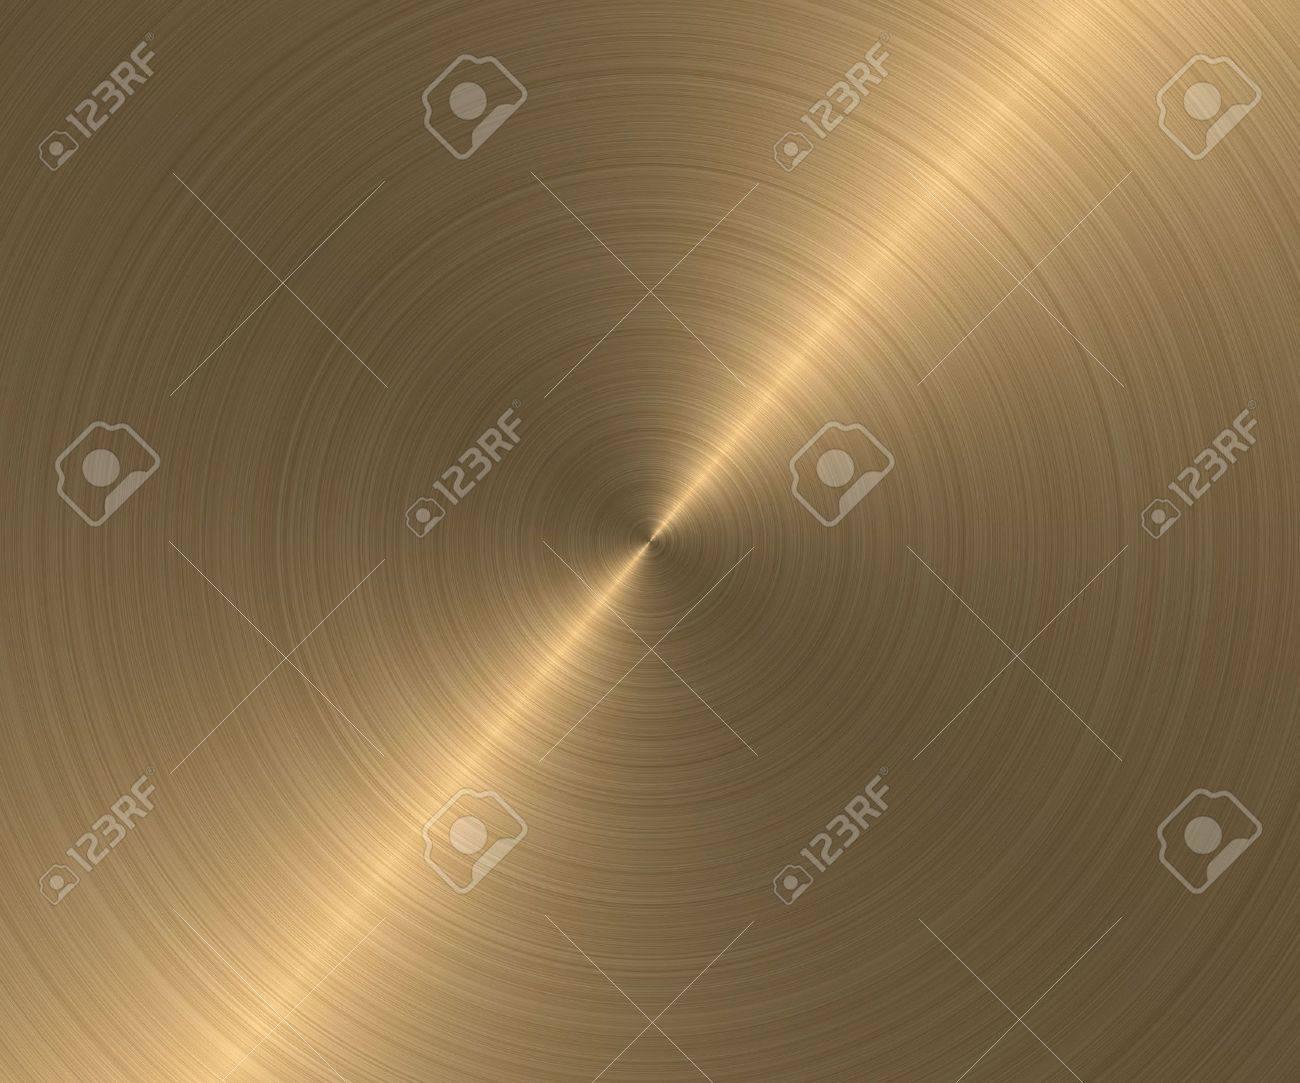 gold metal Stock Photo - 5361934